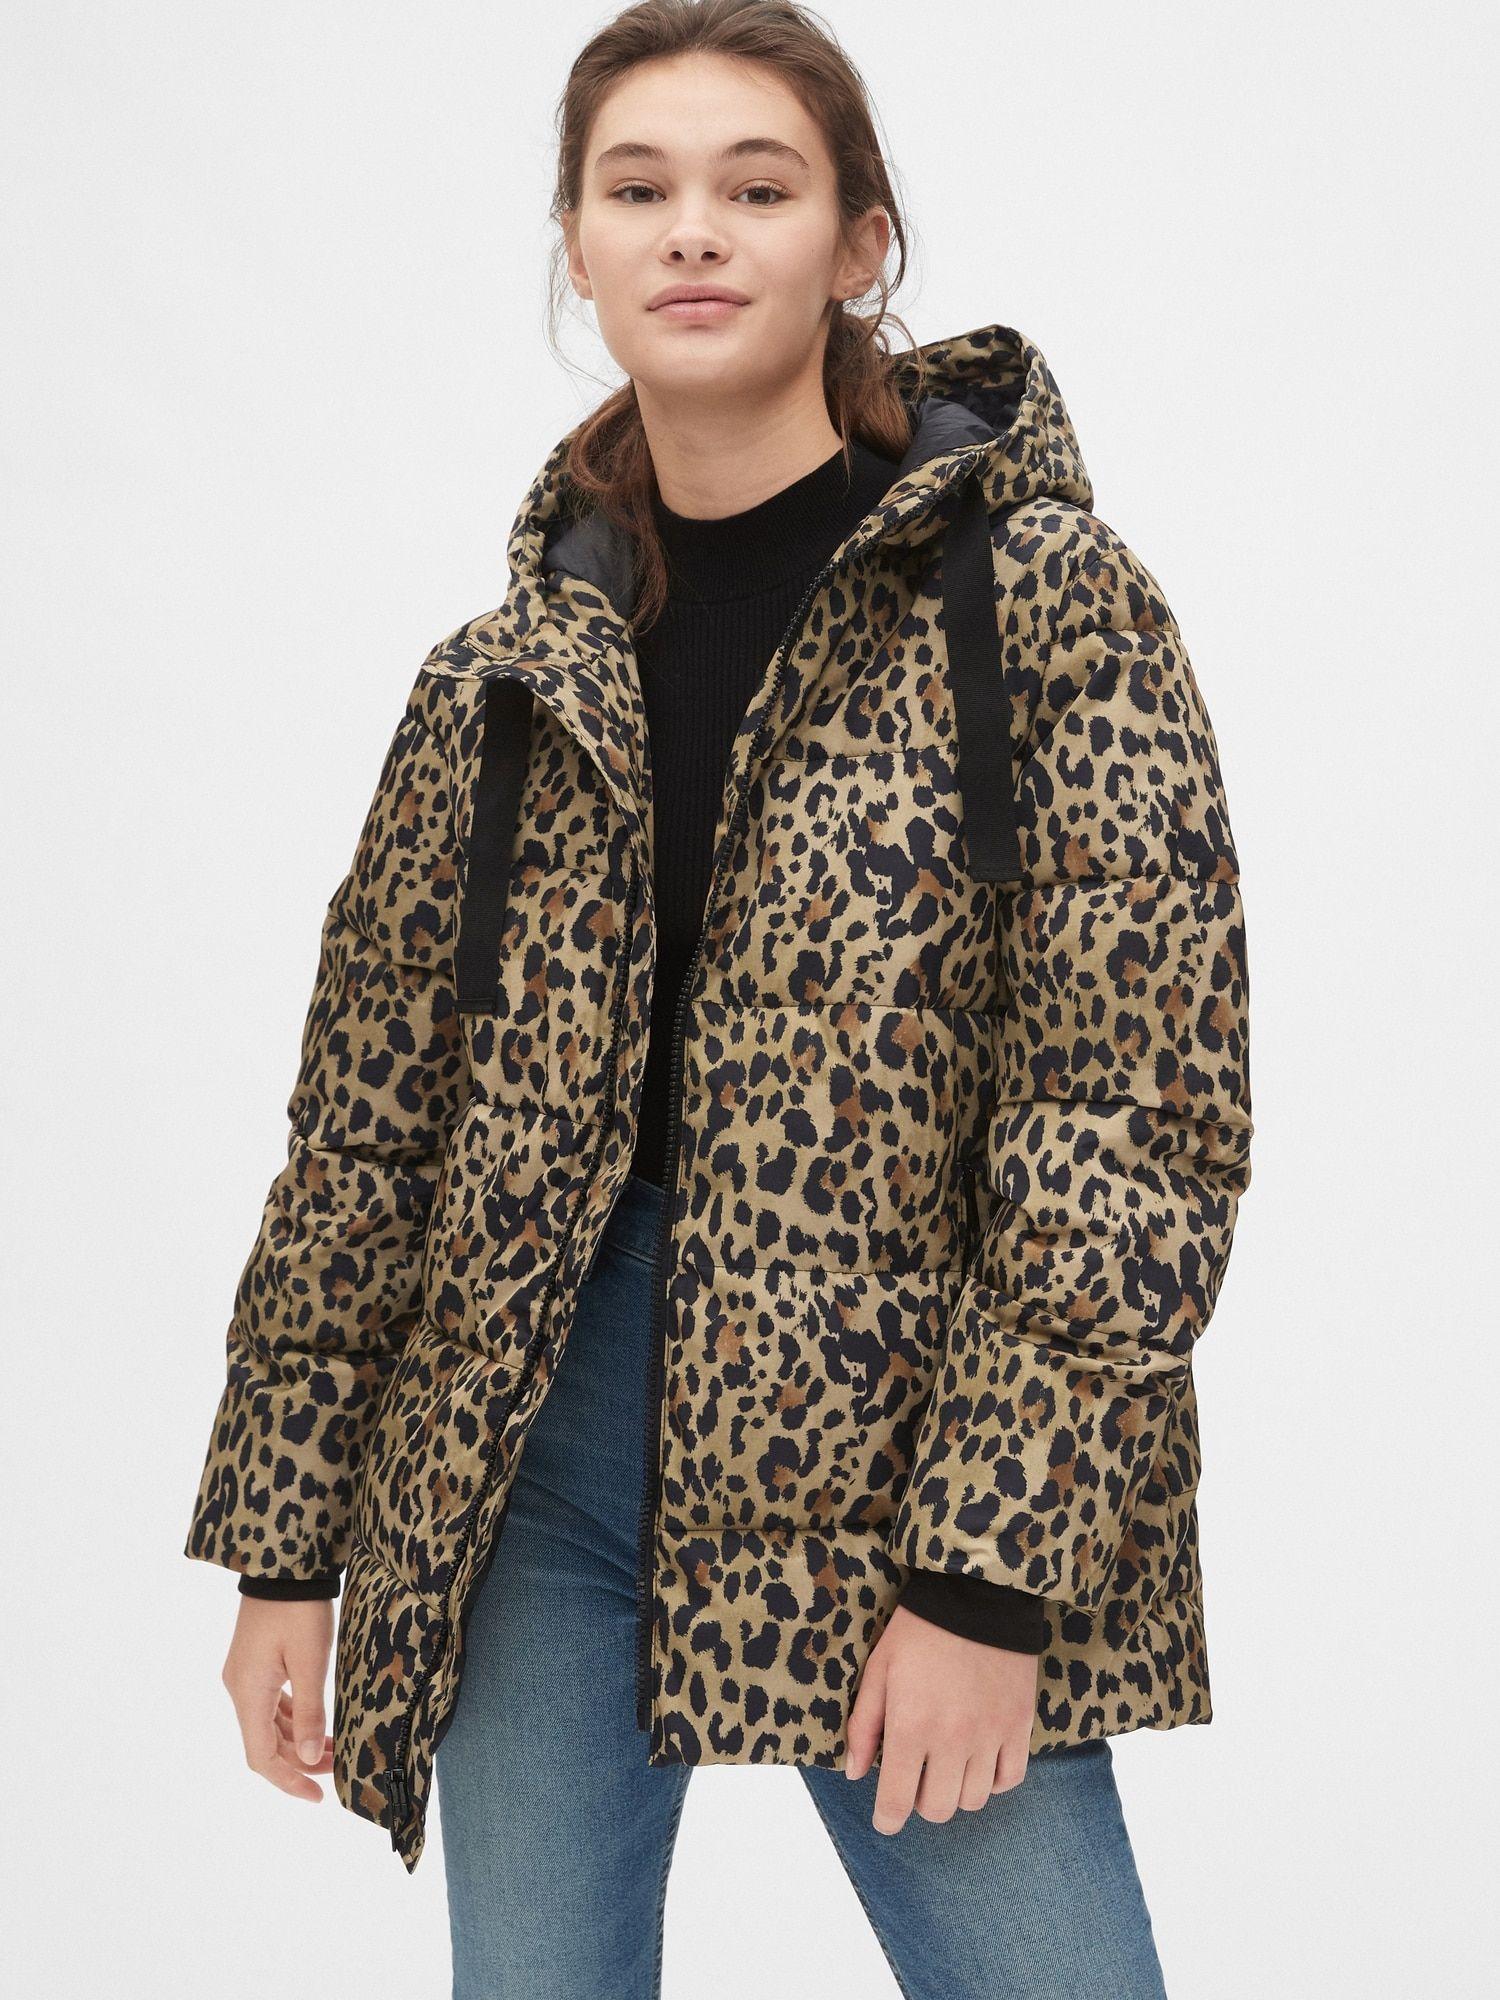 Coldcontrol Max Hooded Print Puffer Jacket Gap Coats Jackets Women Coat Jackets [ 2000 x 1500 Pixel ]